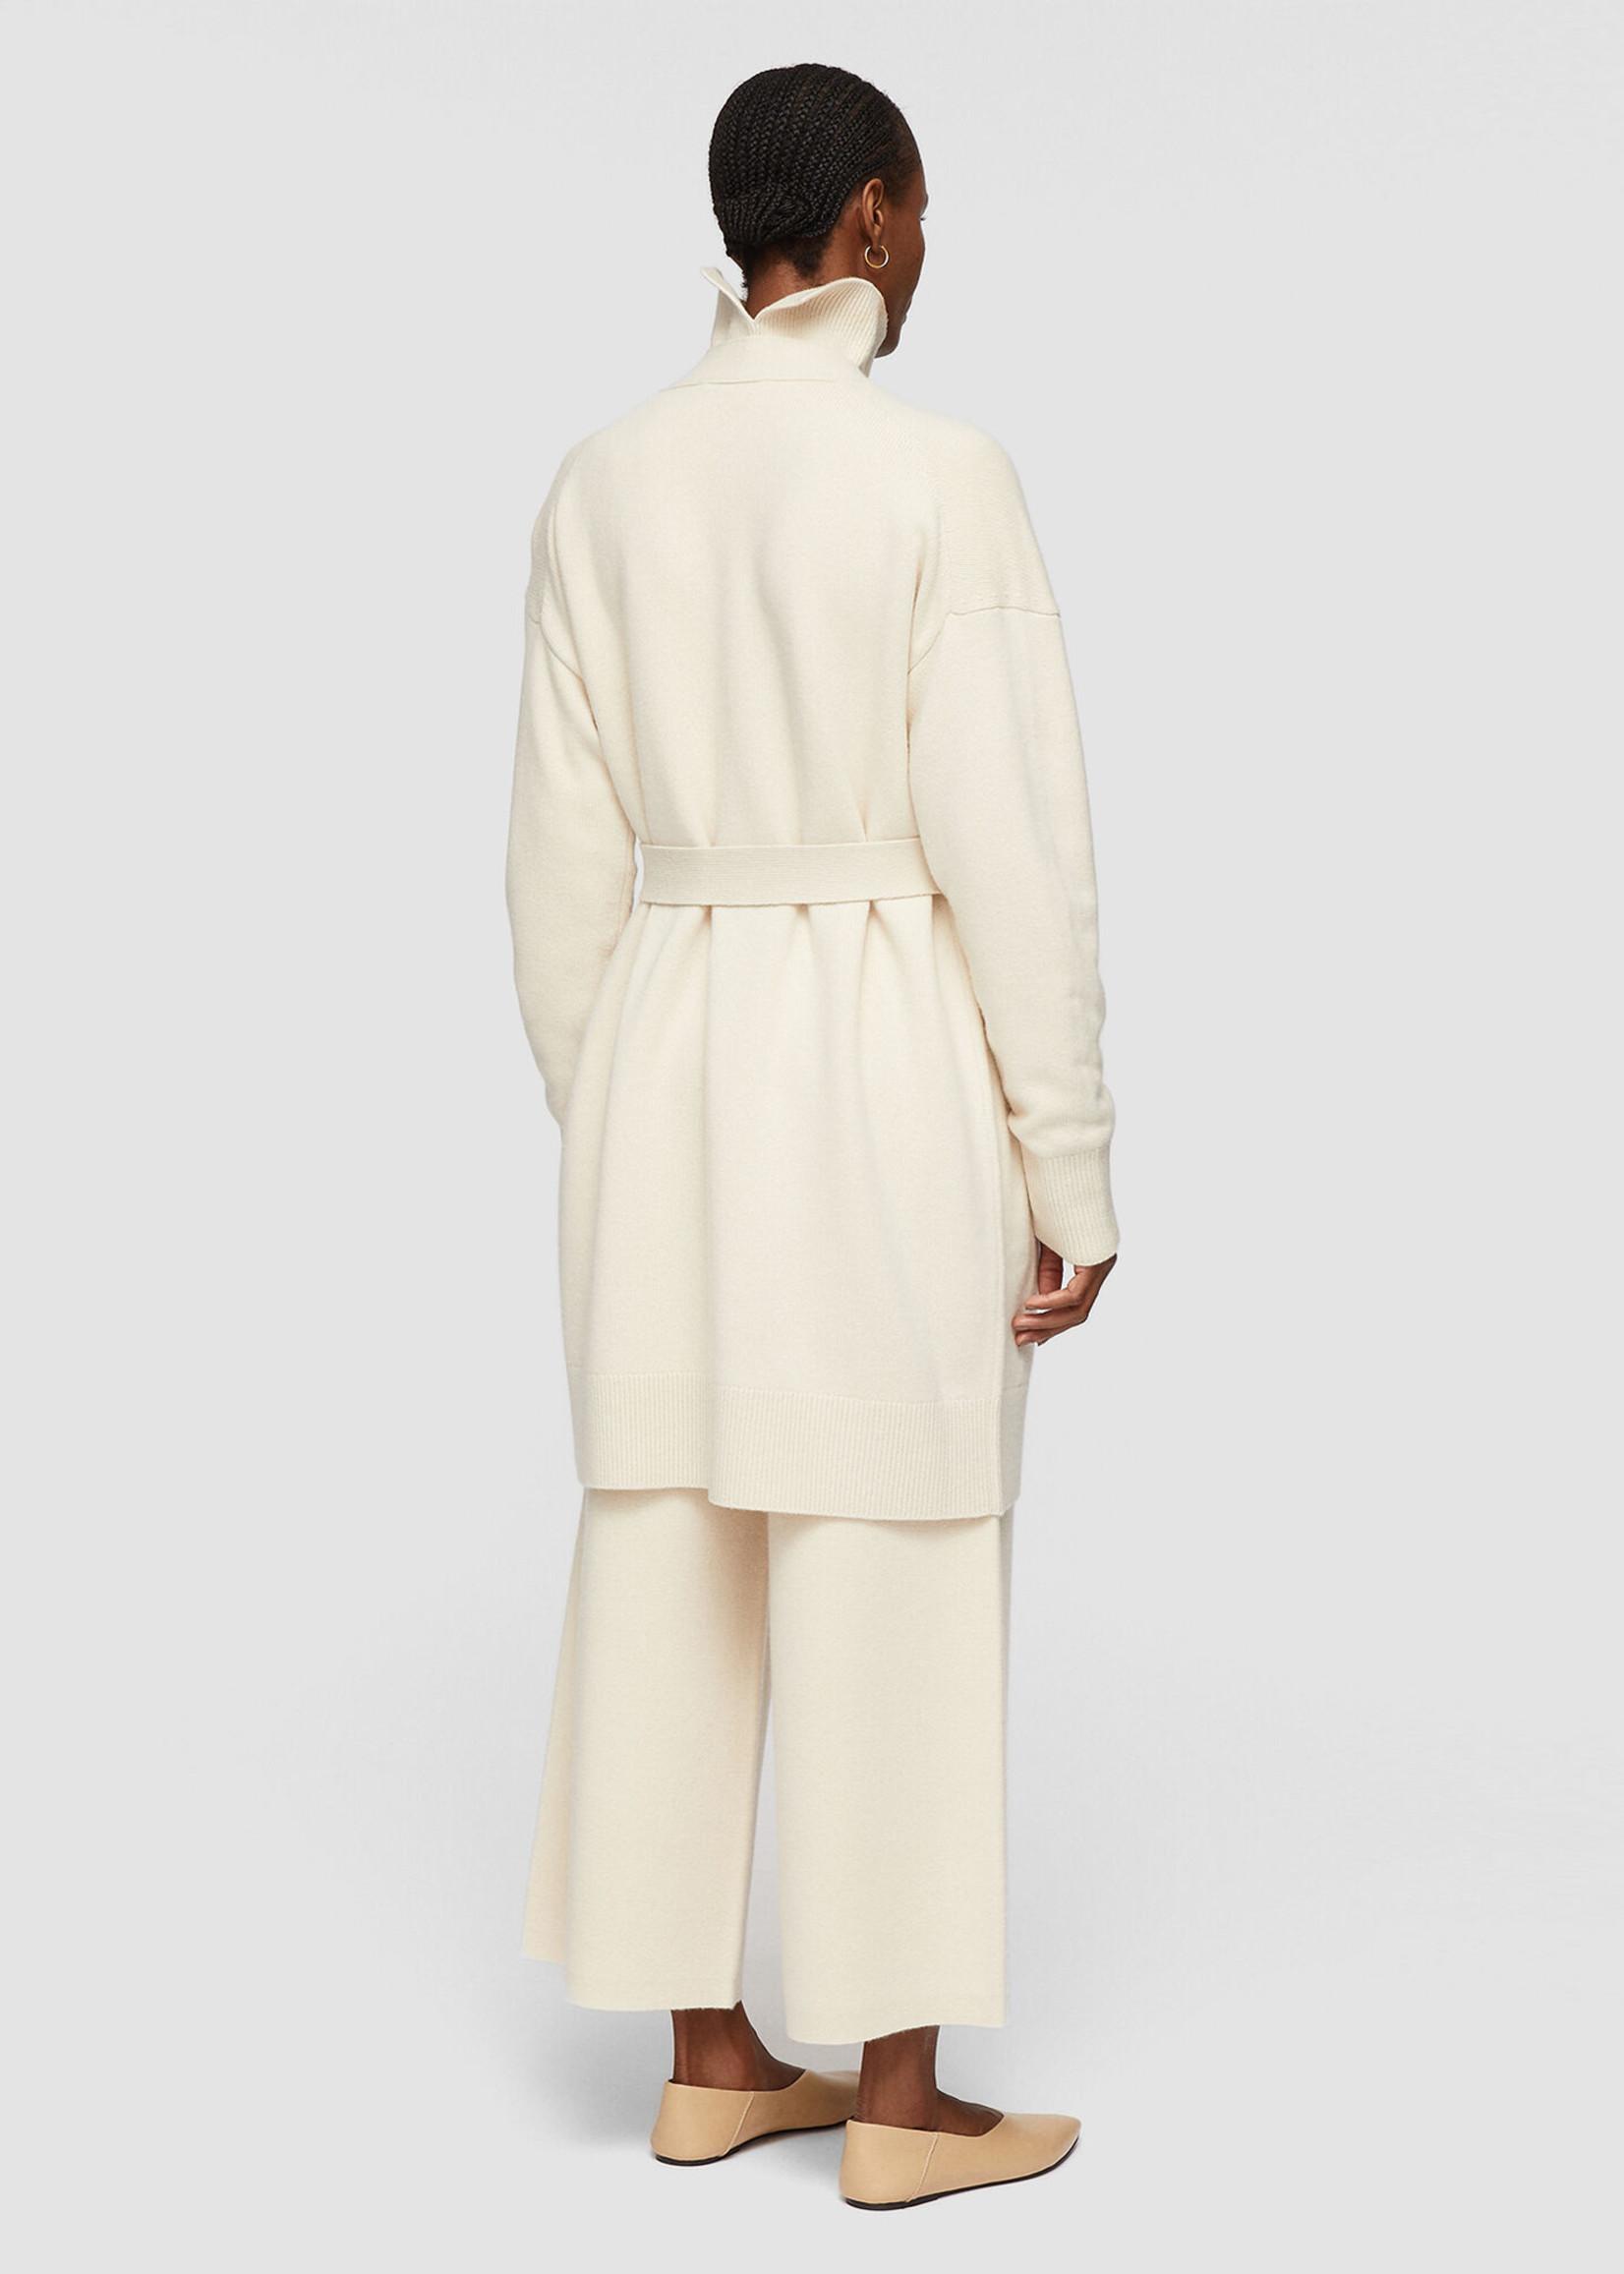 Joseph Joseph cardigan soft wool , ivory